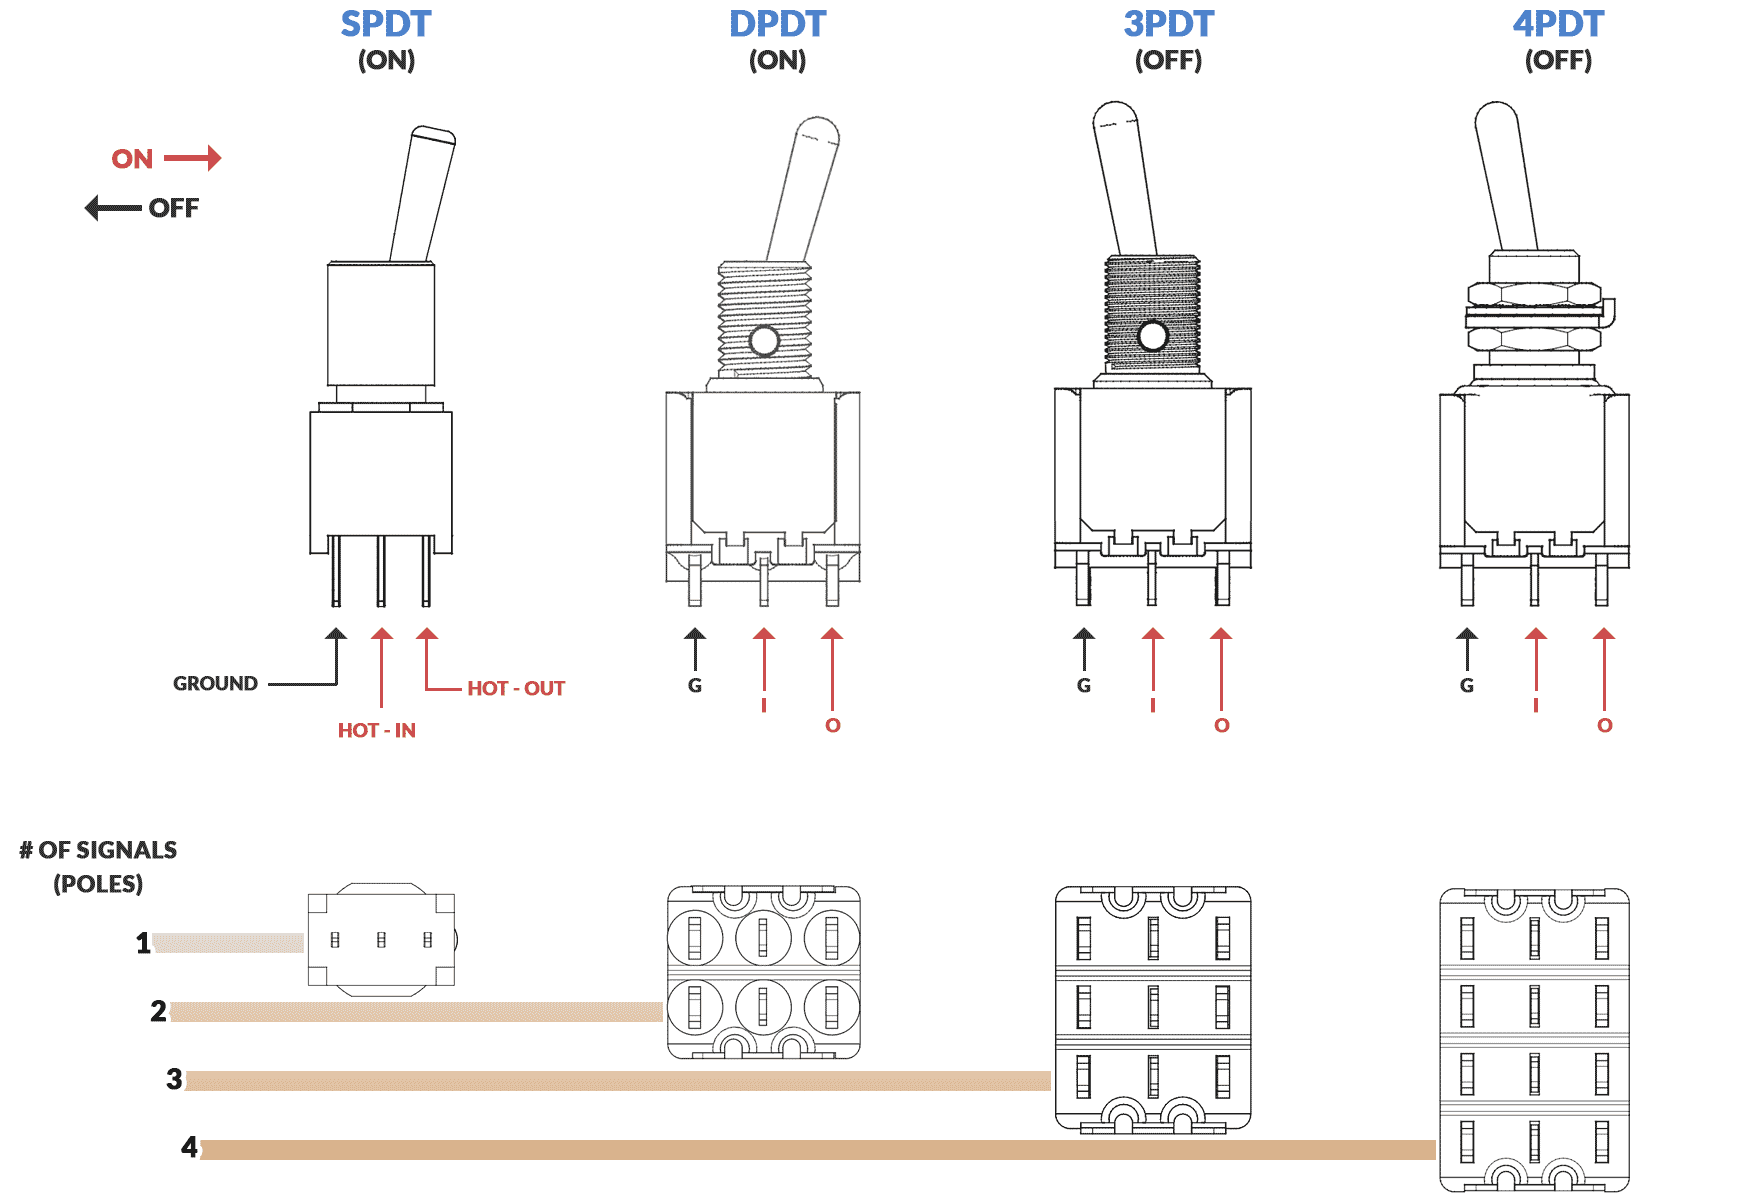 wiring diagram kill switch guitar free download wiring diagram rh xwiaw us predator engine kill switch wiring predator engine kill switch wiring